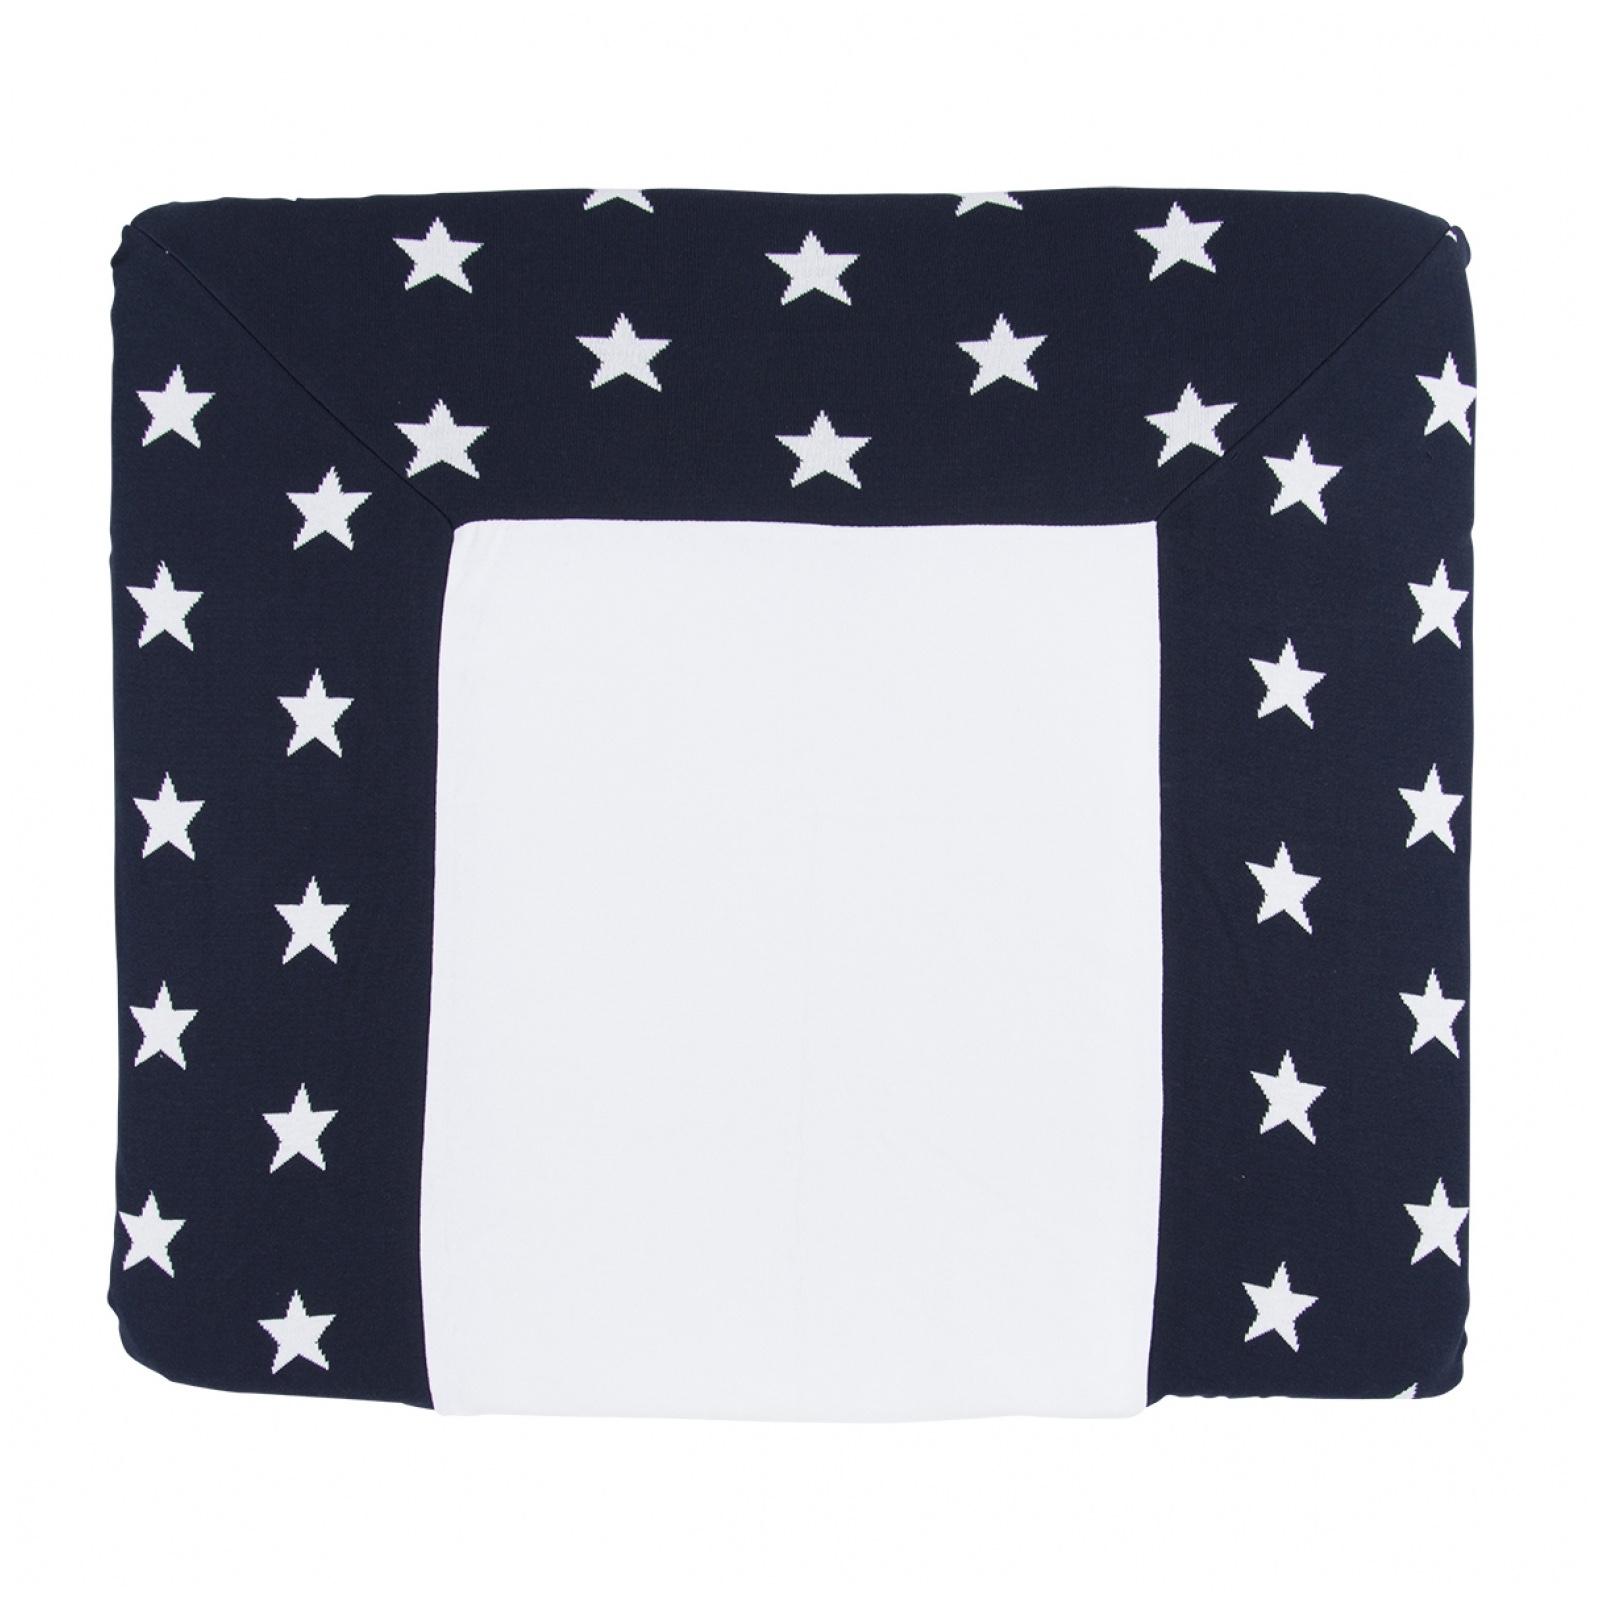 Wickelauflagenbezug Sterne dunkelblau weiß (Gr. 75x85 cm)